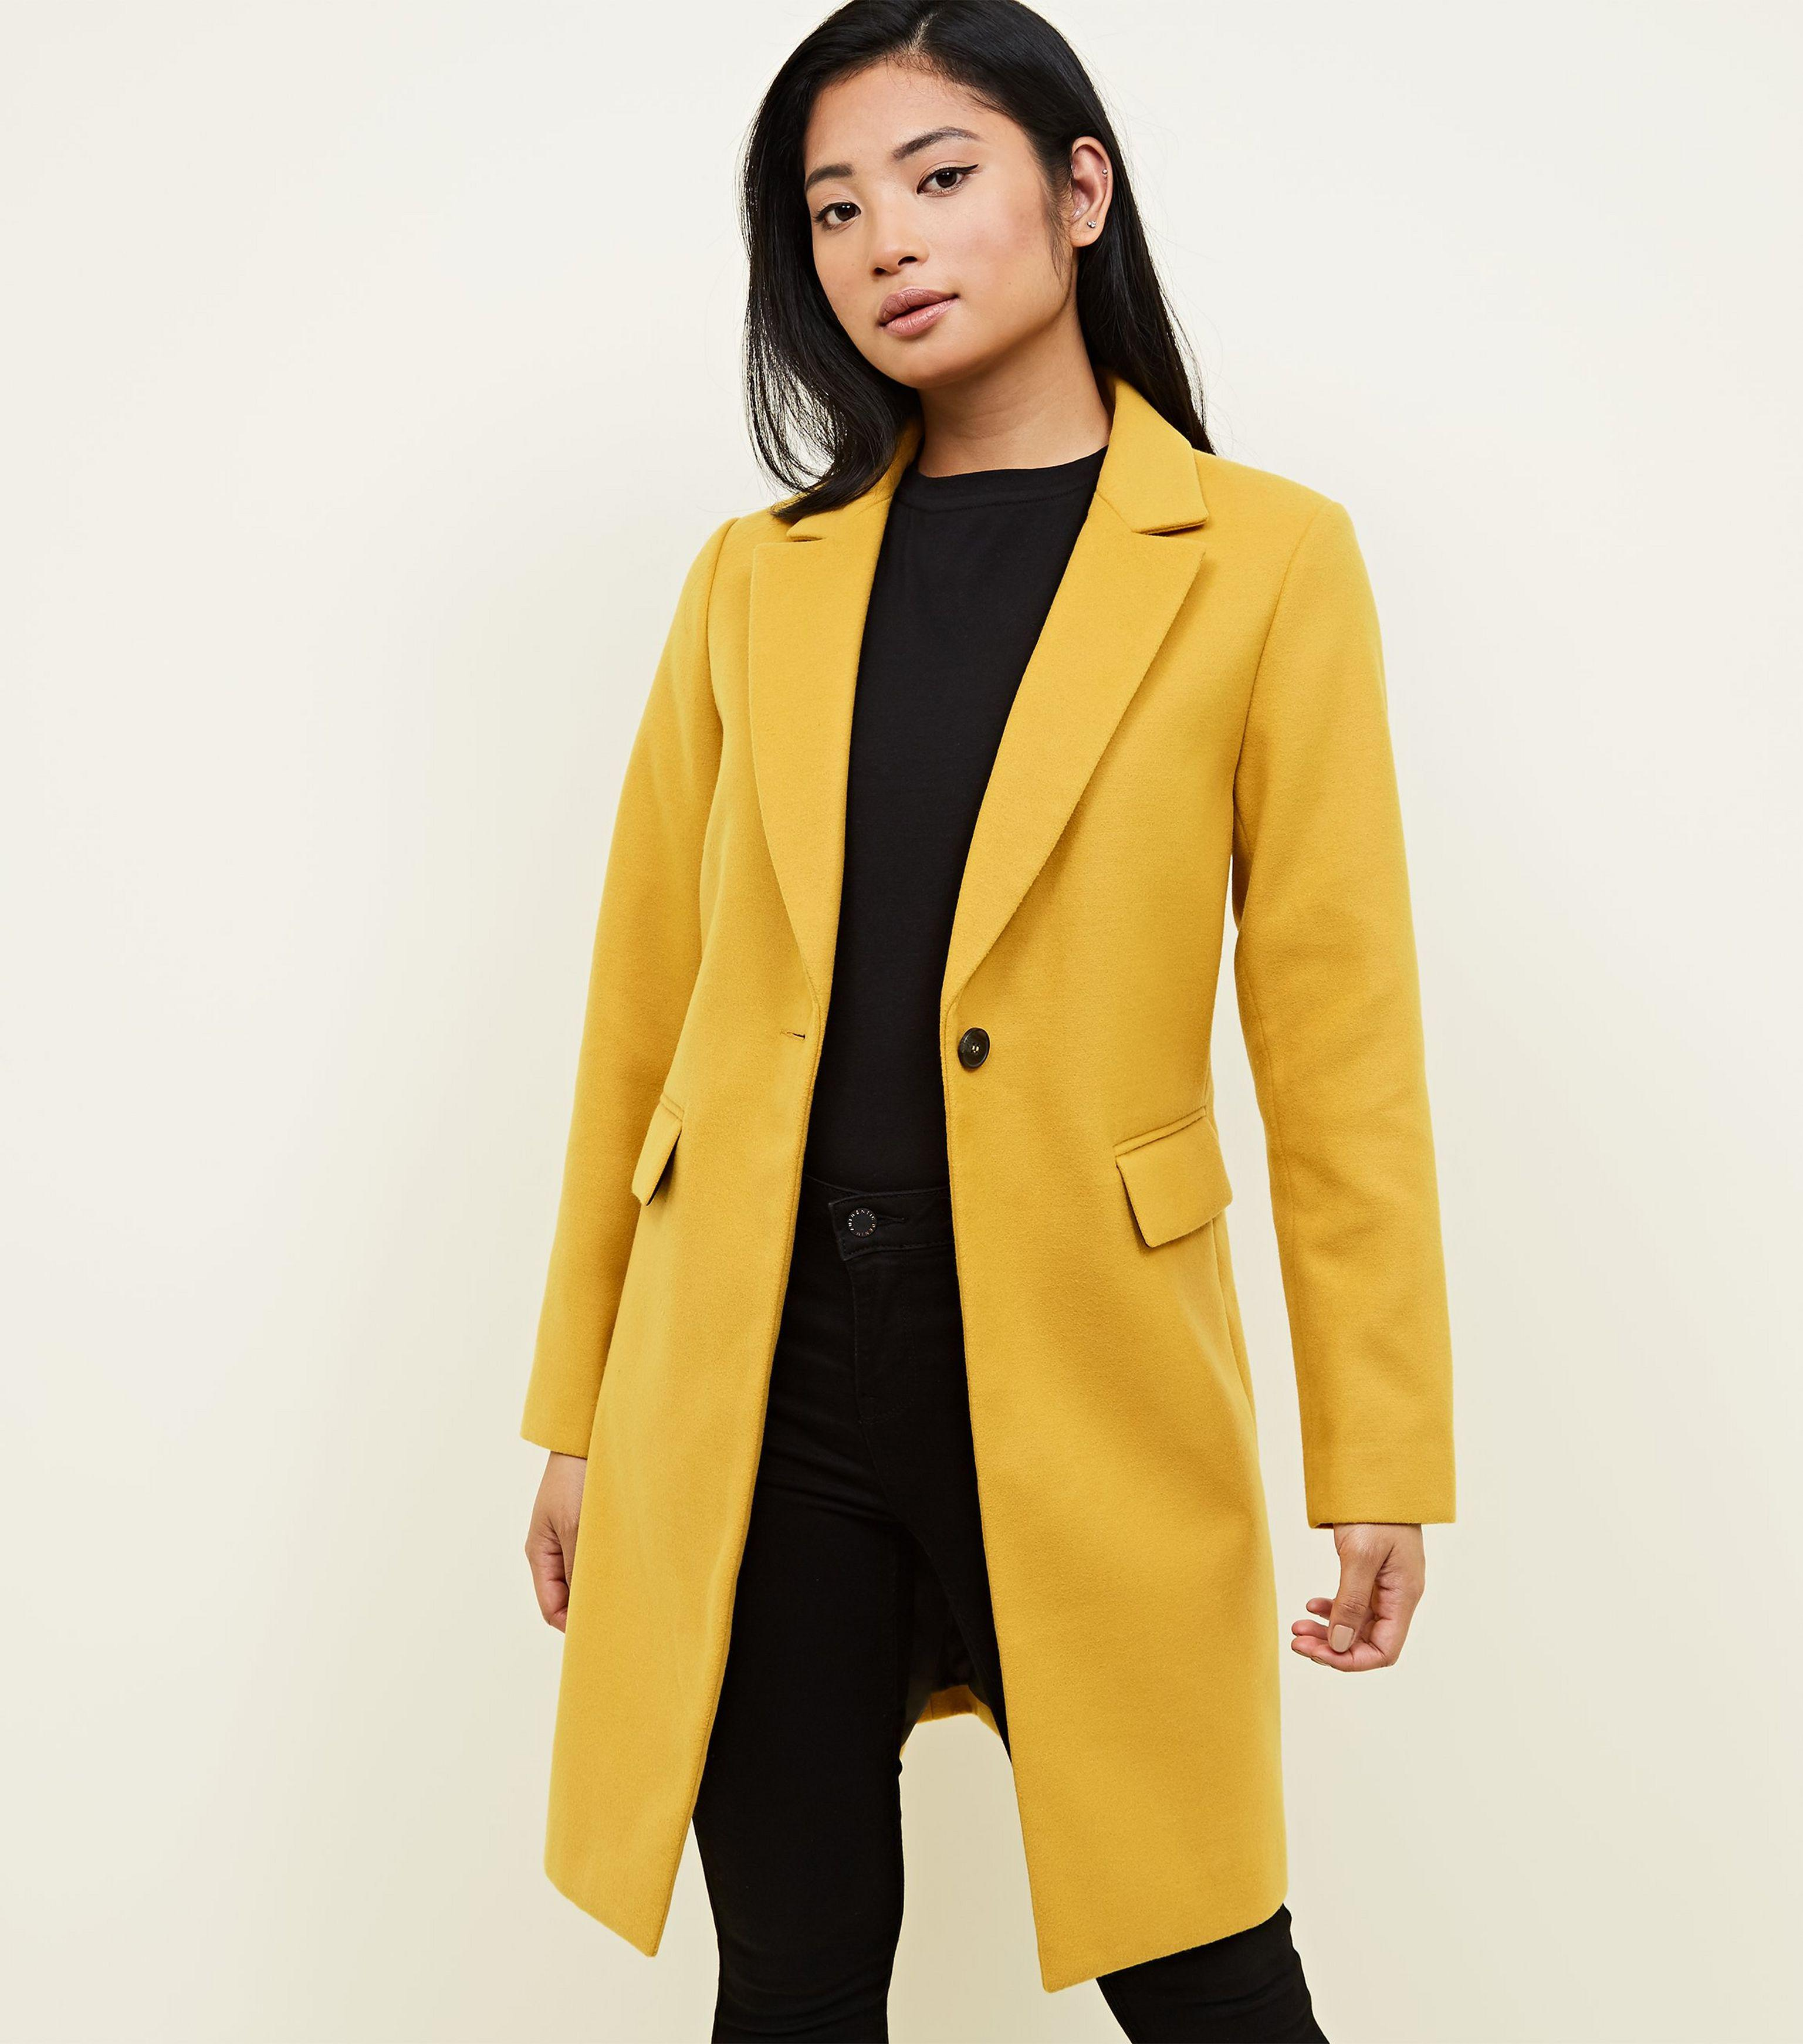 ad80ae73b129 New Look Petite Mustard Revere Collar Longline Coat in Yellow - Lyst